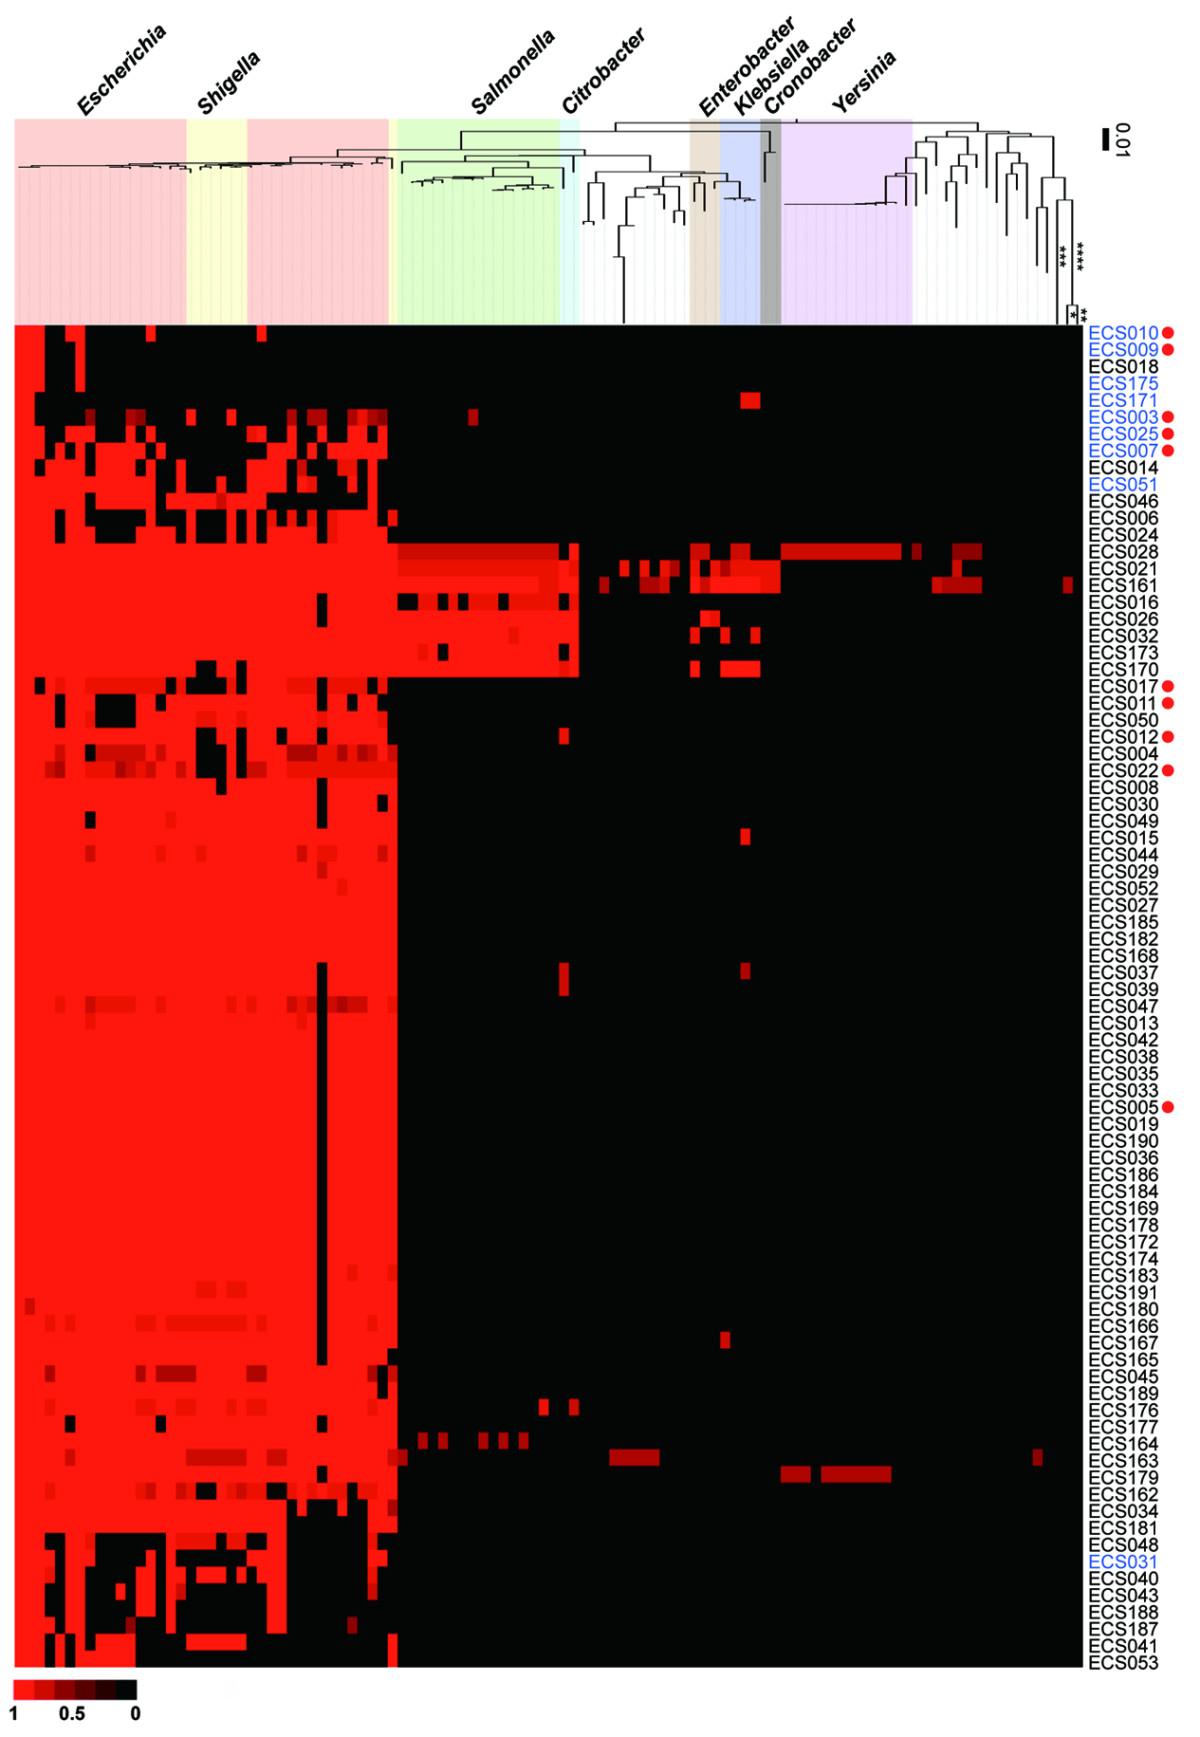 https://static-content.springer.com/image/art%3A10.1186%2F1471-2164-12-428/MediaObjects/12864_2011_3578_Fig5_HTML.jpg